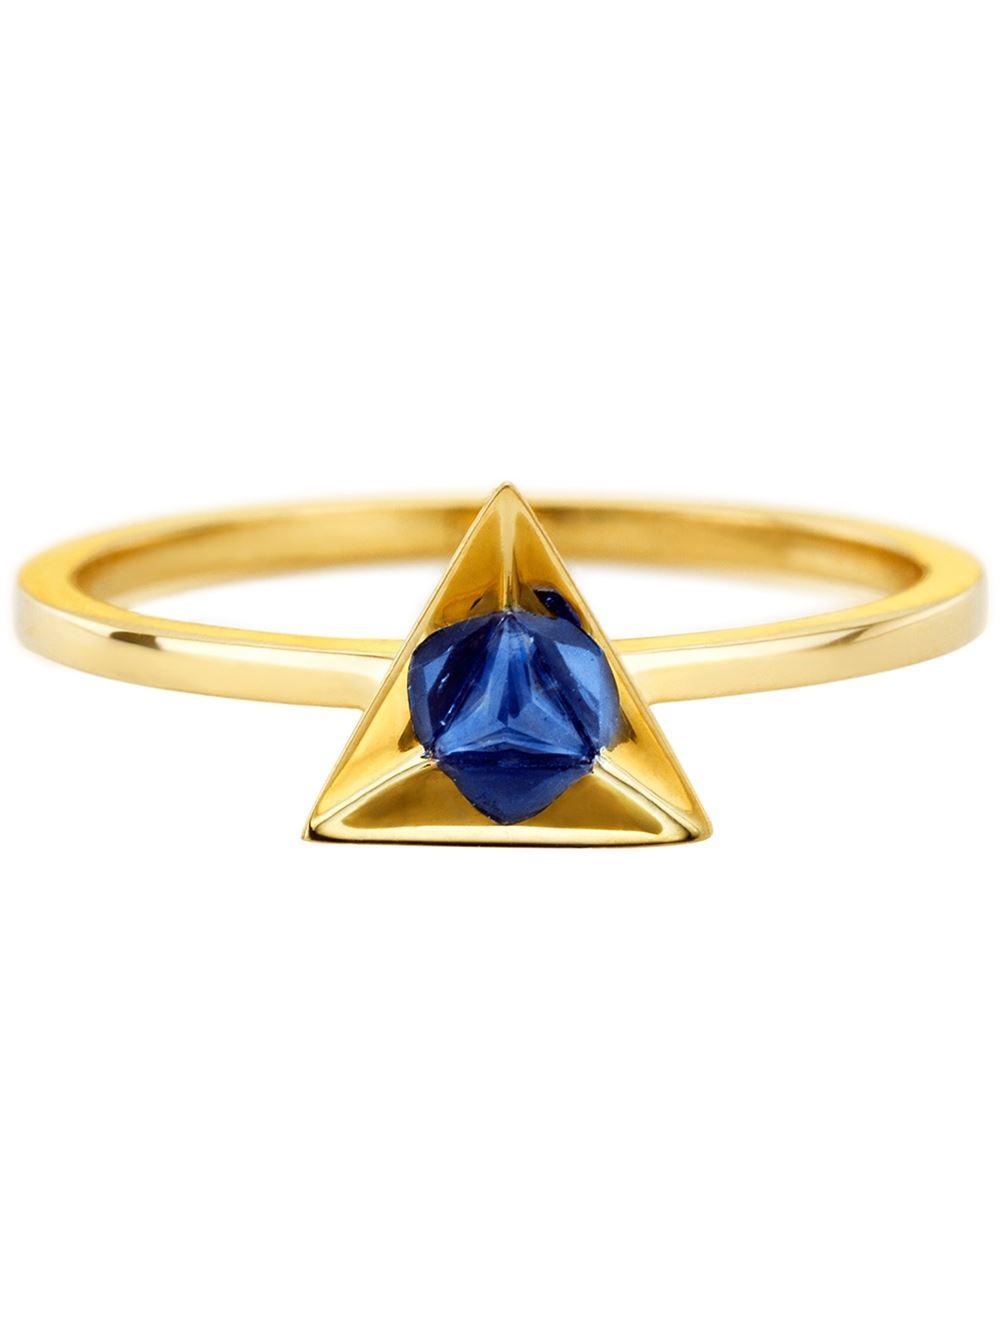 Ruifier 'stella' Sapphire Ring in Metallic